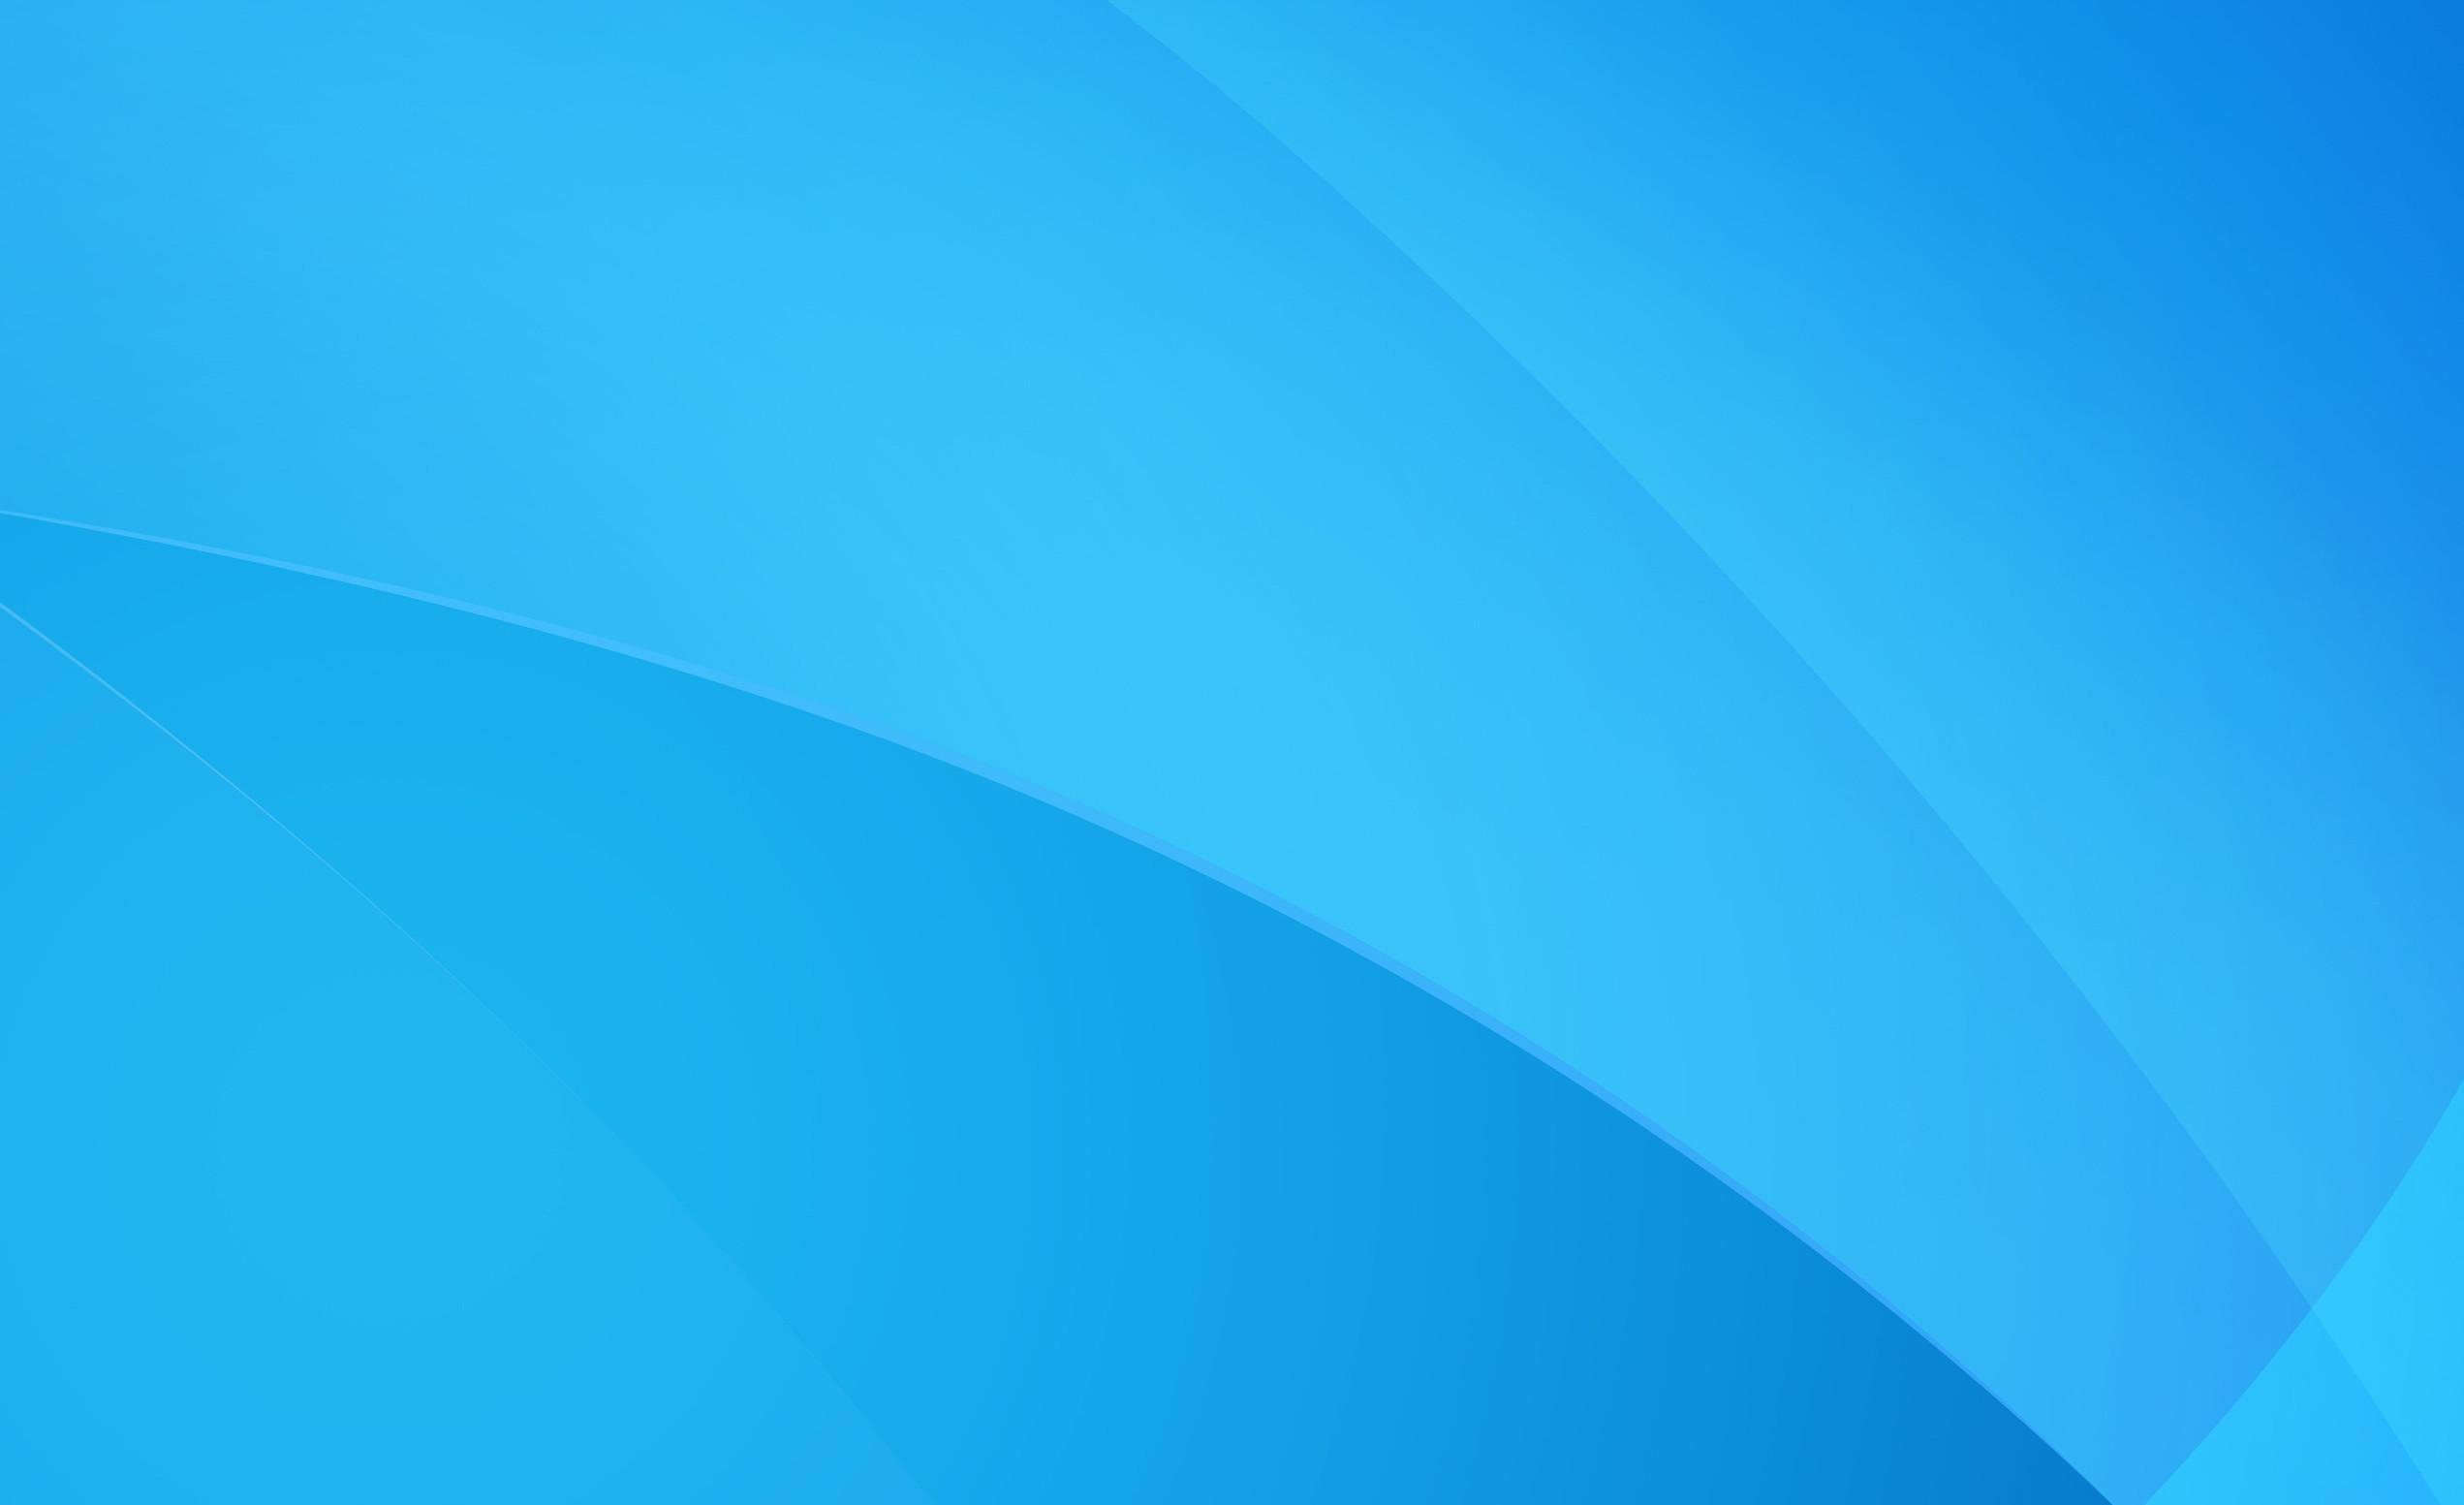 blue-background-images-9